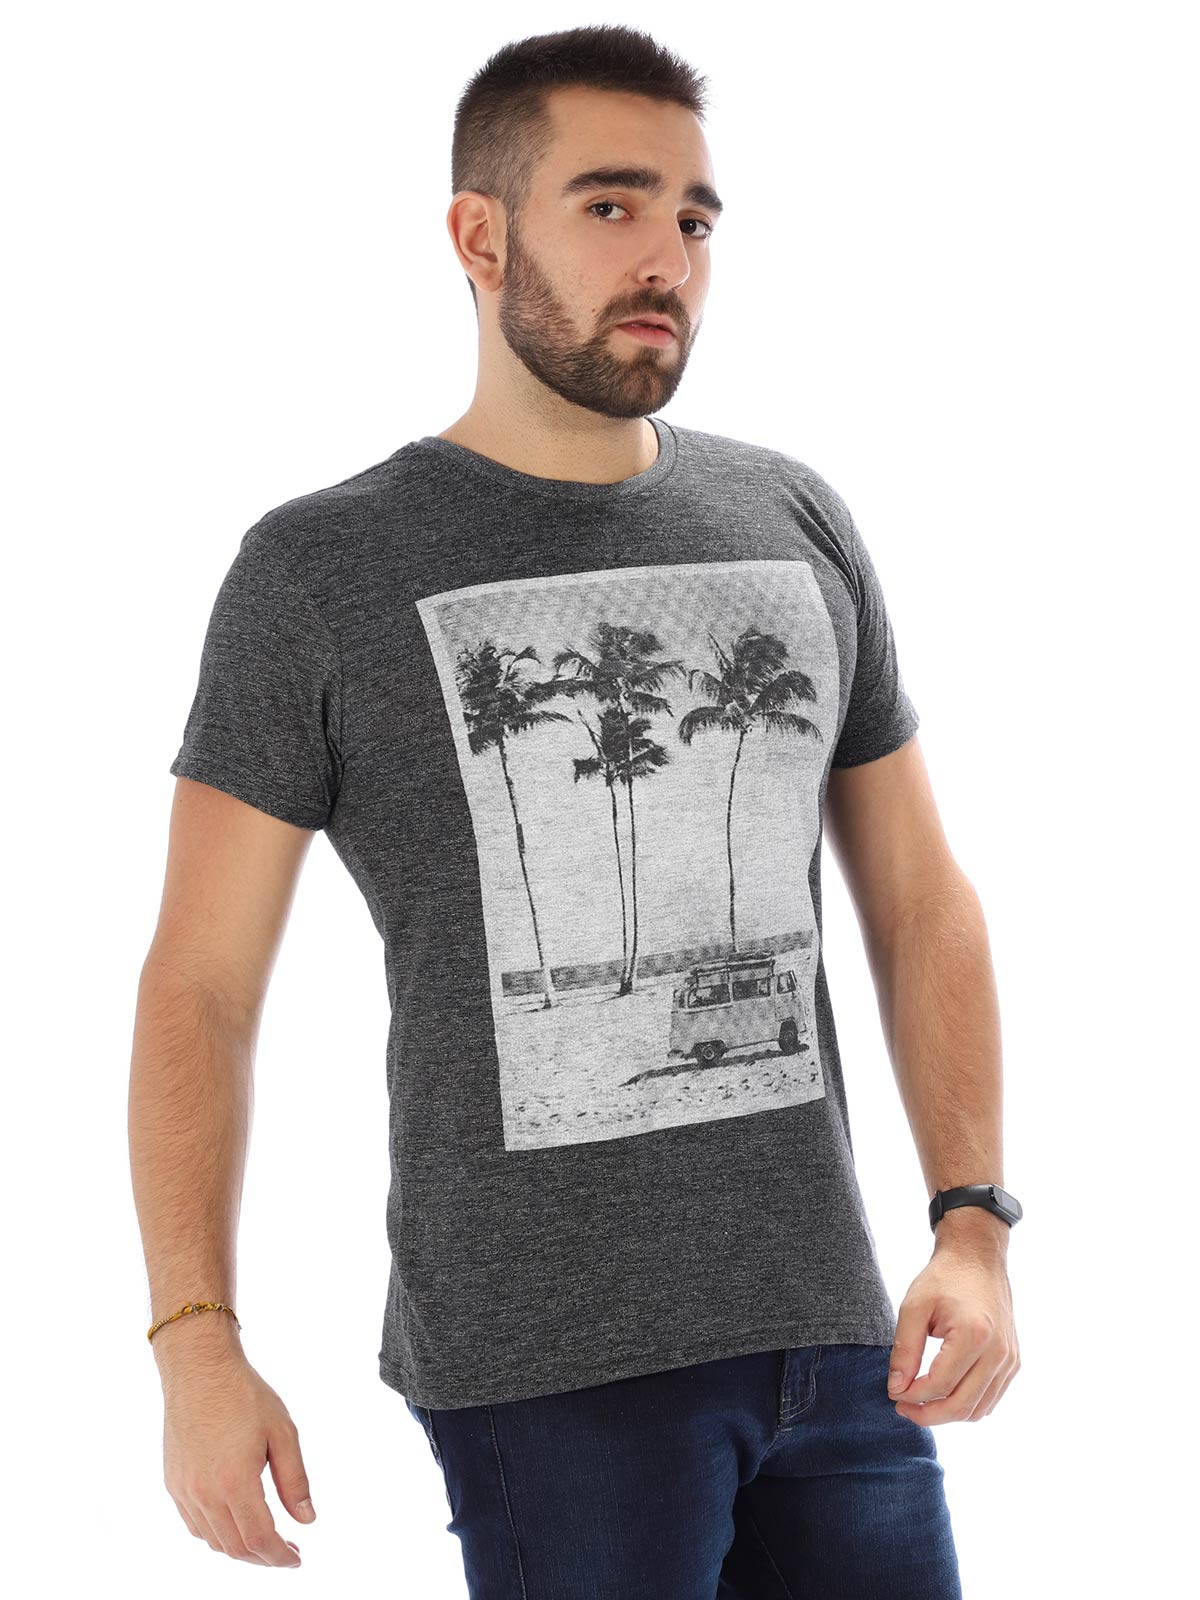 Camiseta Masculina Slim Fit Manga Curta Uno Preto